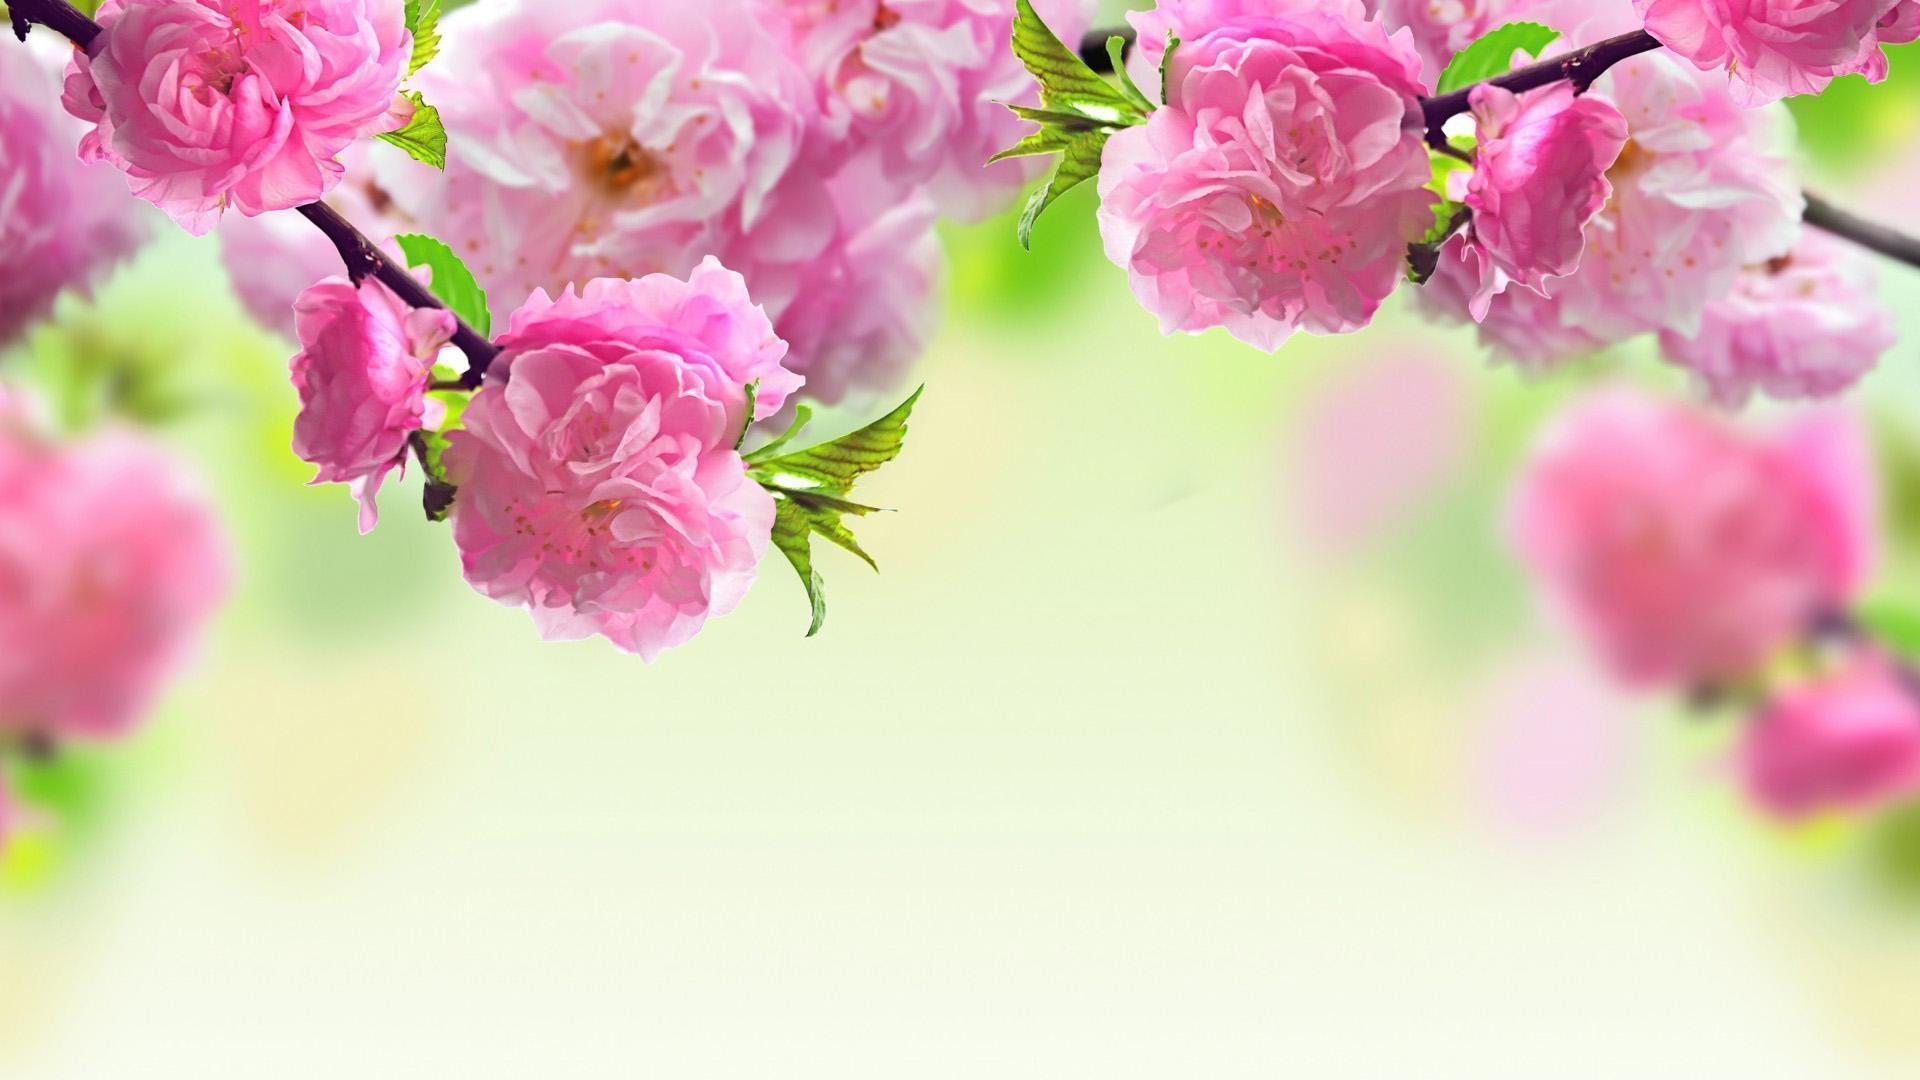 Spring Desktop Backgrounds 30 Background Pictures 1920x1080